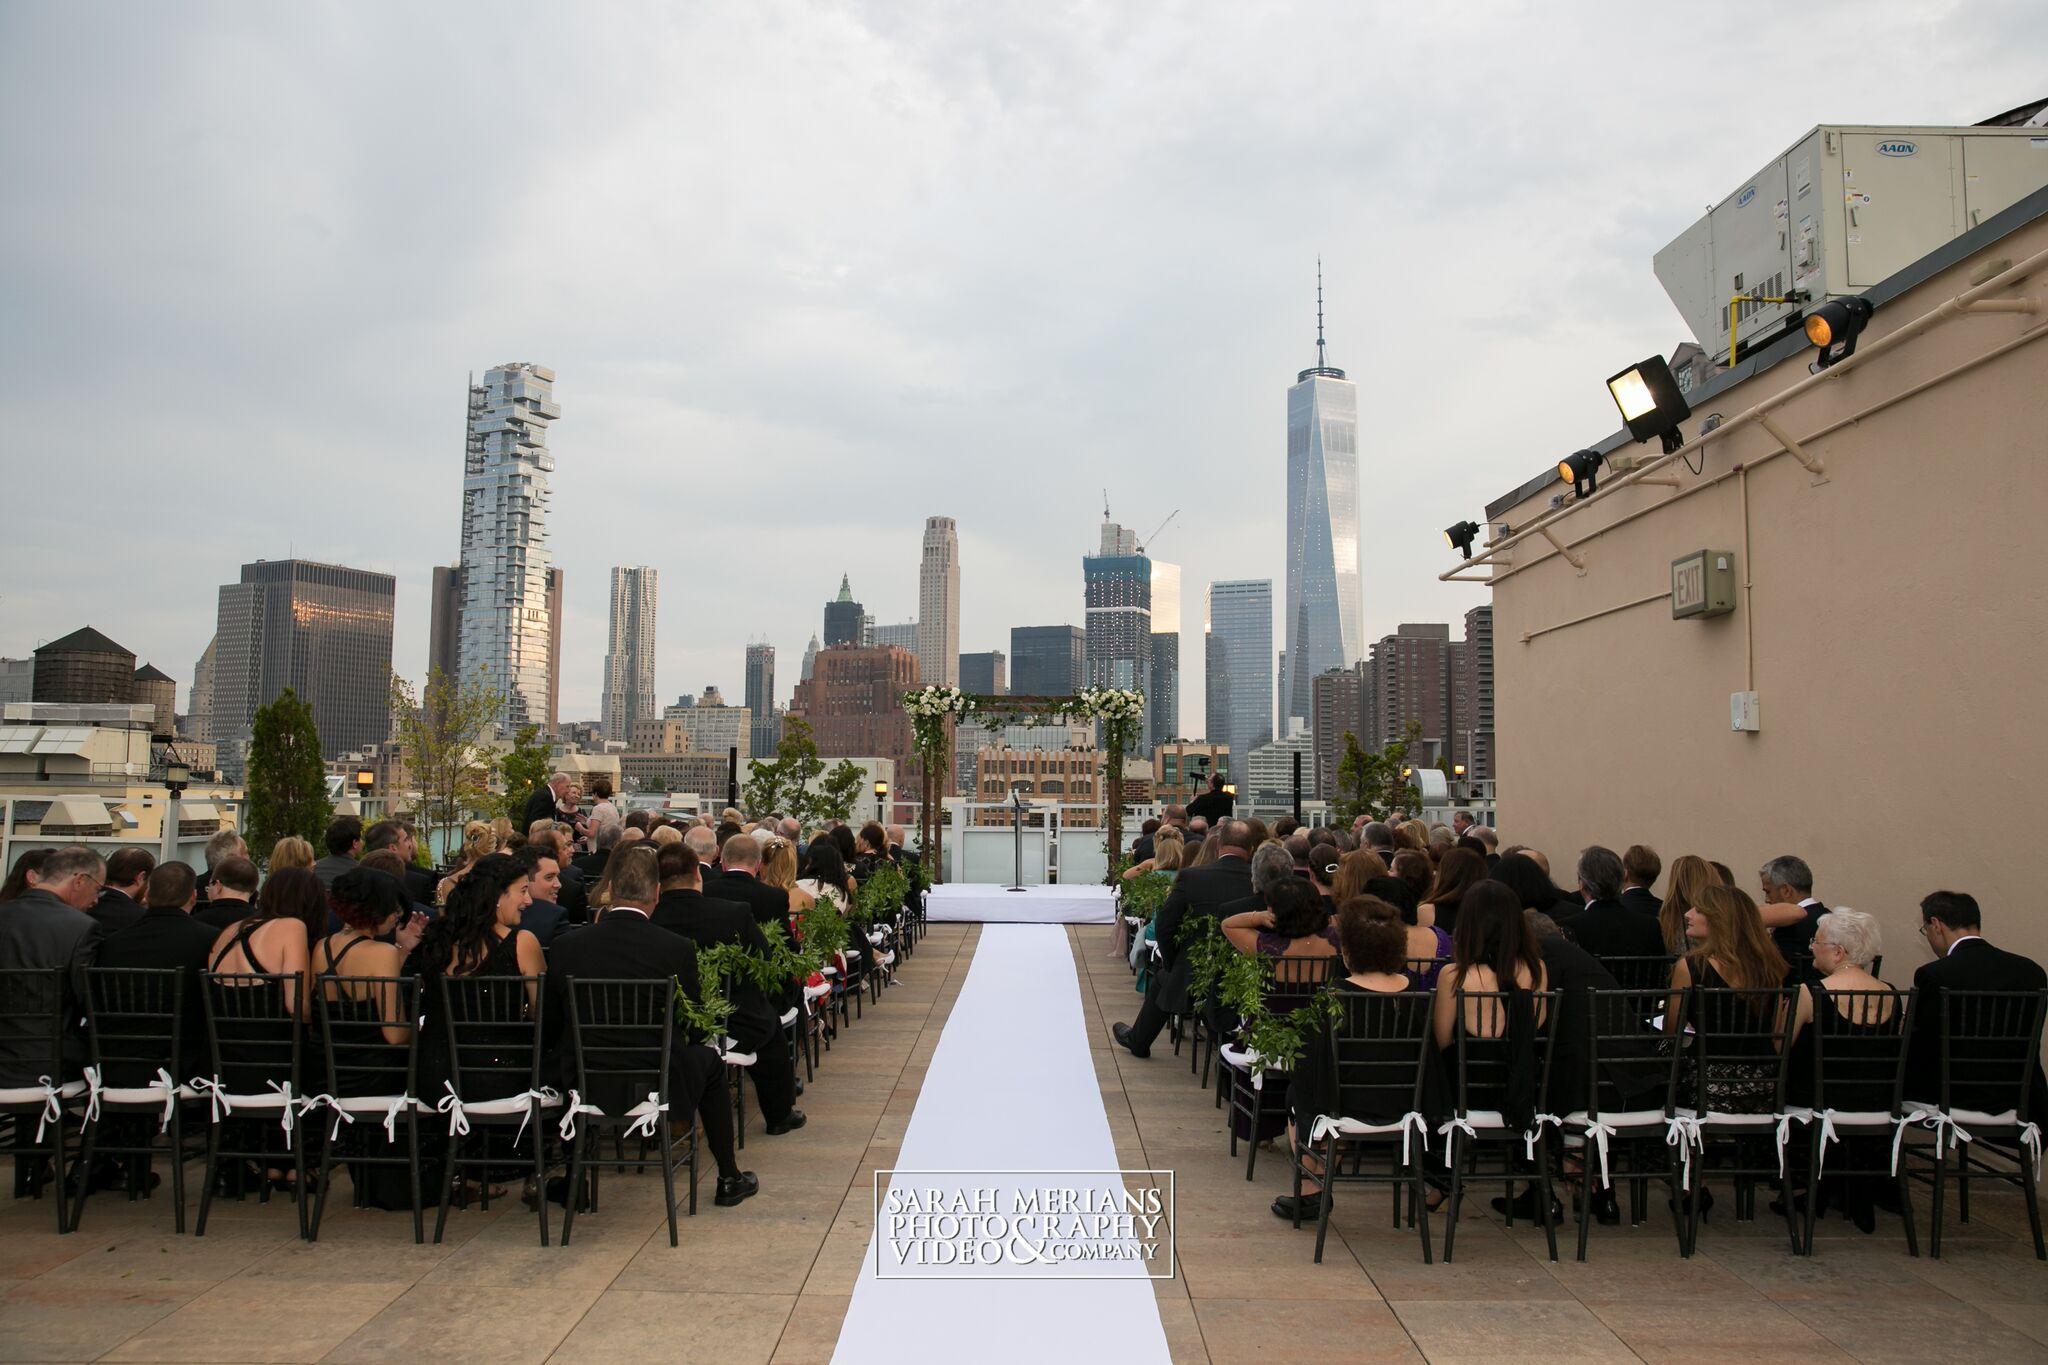 TRIBECA ROOFTOP WEDDING - Monique Banks Party